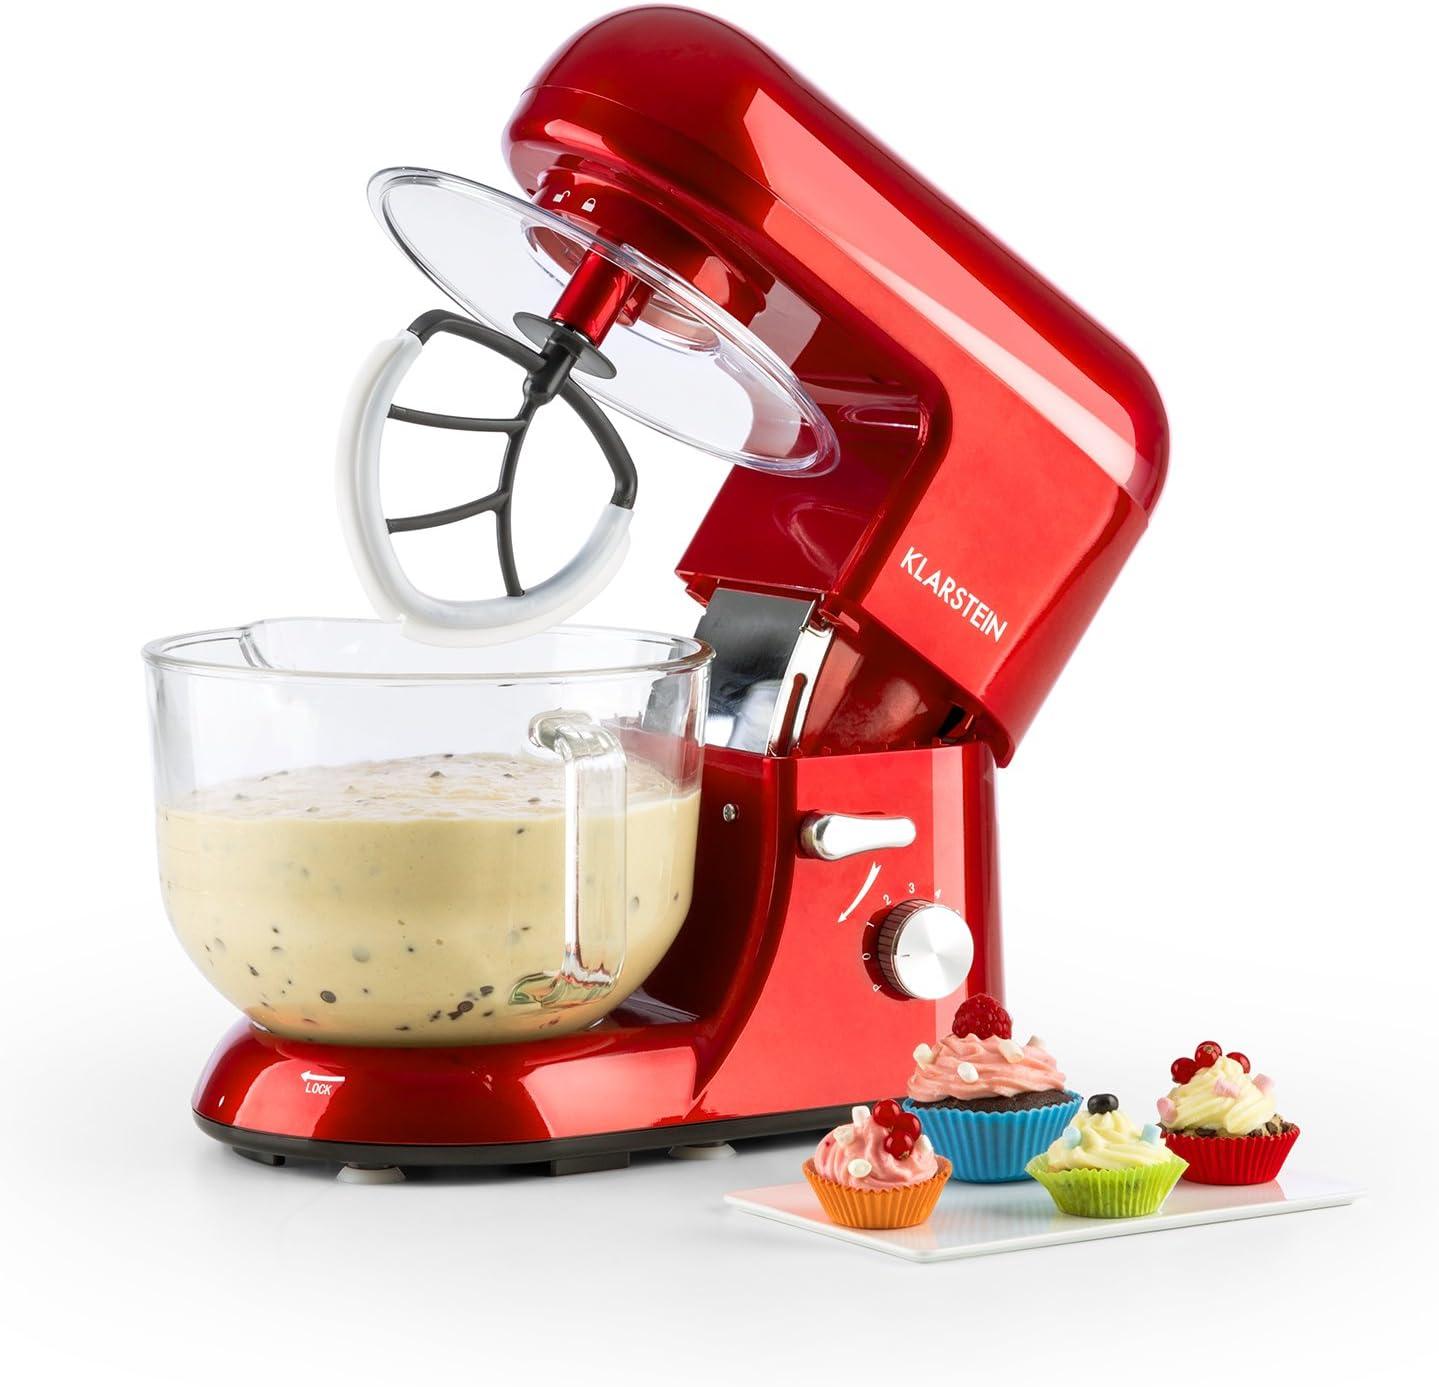 Klarstein - Bella Rossa 2G, Robot de Cocina, Mezcla, Amasadora, Batidora, 1200W, 2,5 a 5,2 L, Bol Cristal, 6 velocidades, Función Pulso, Sistema de Mezcla planetaria, Gancho amasar, Rojo